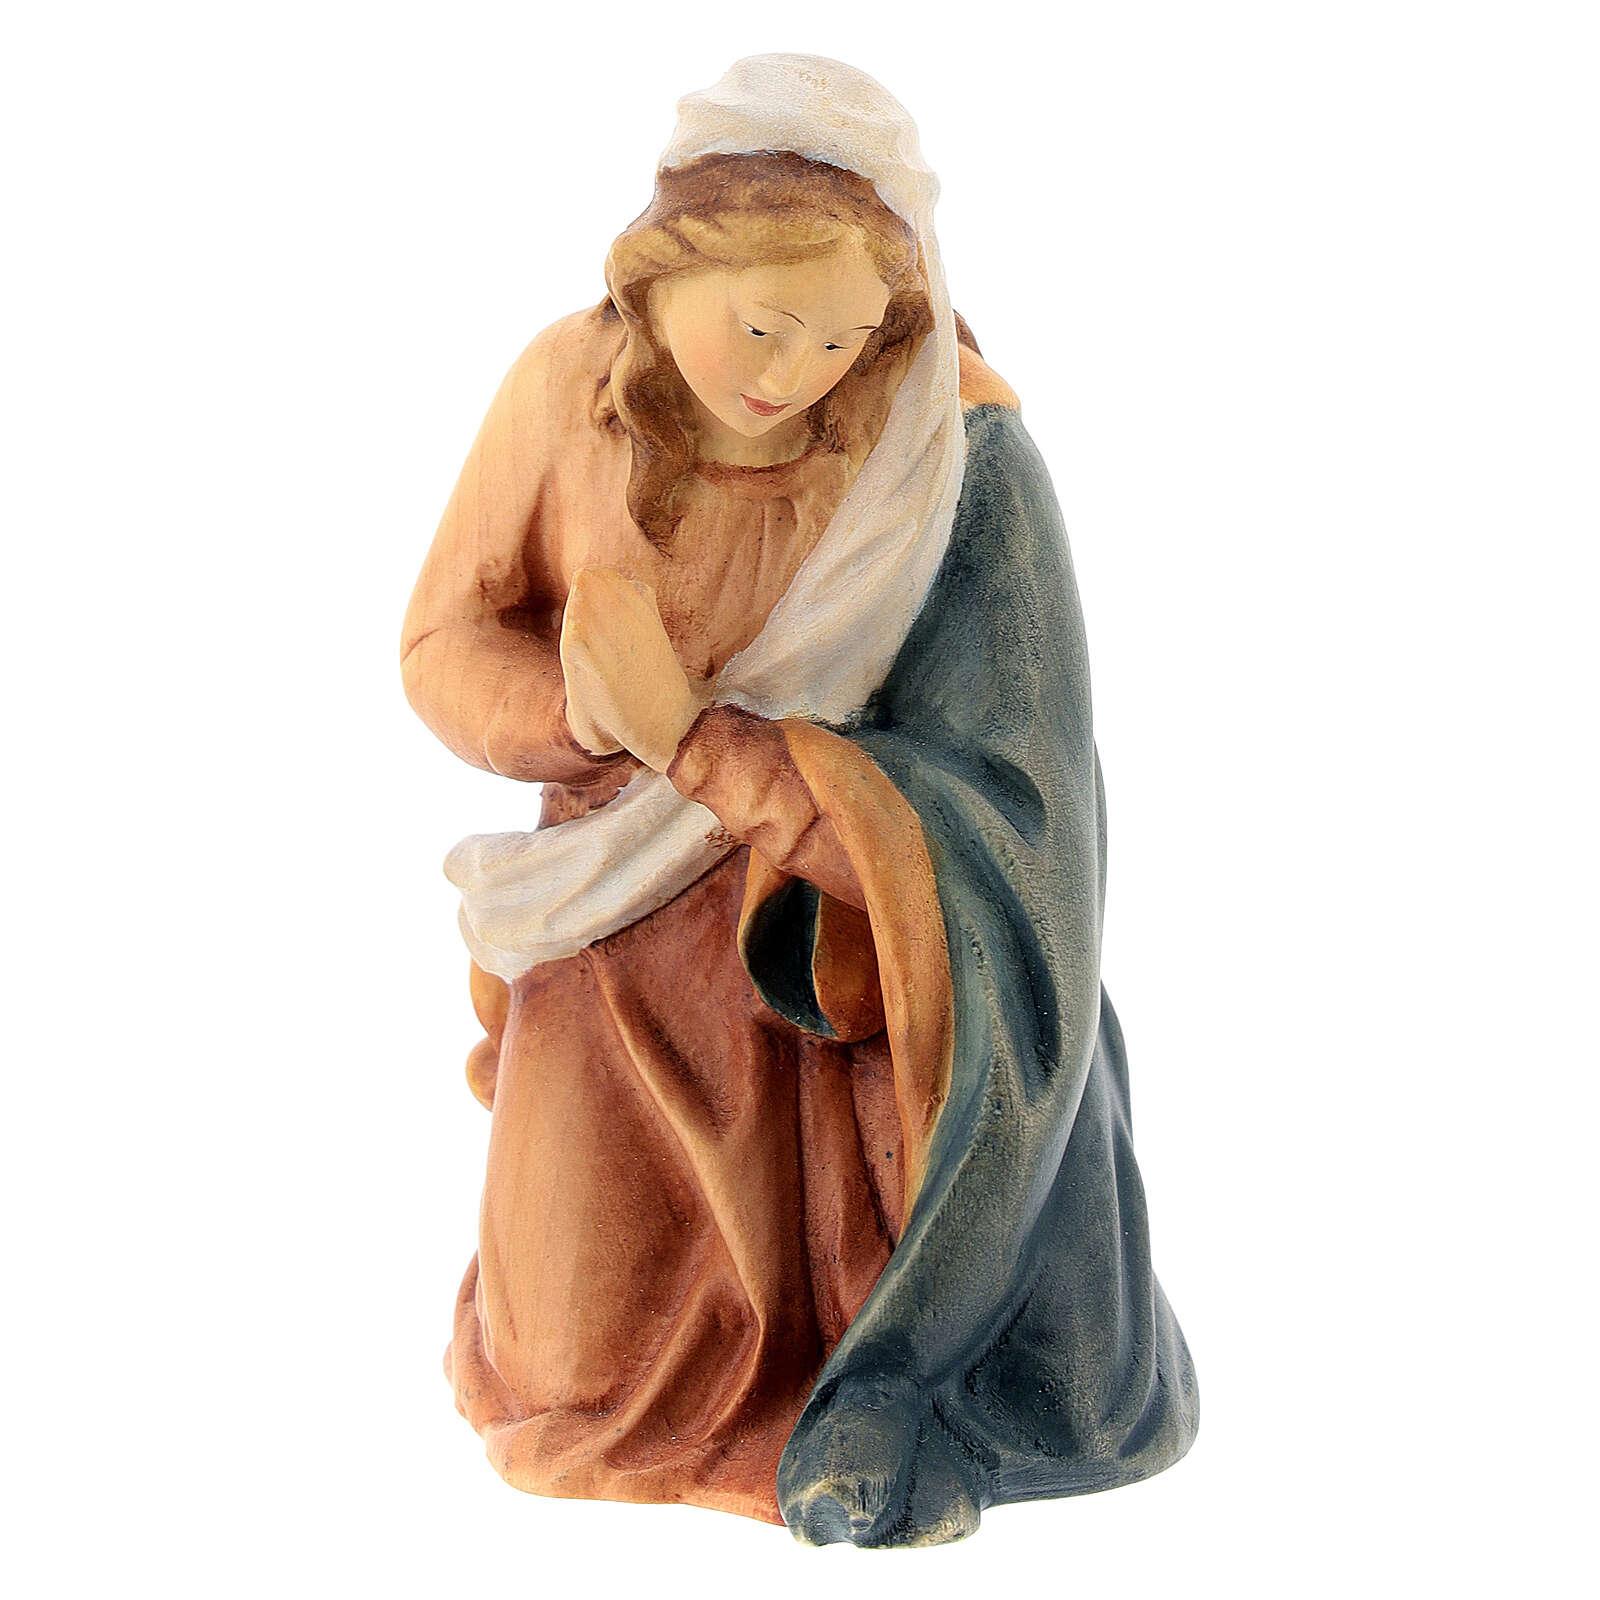 Marie crèche Raphaël 15 cm bois peint Val Gardena